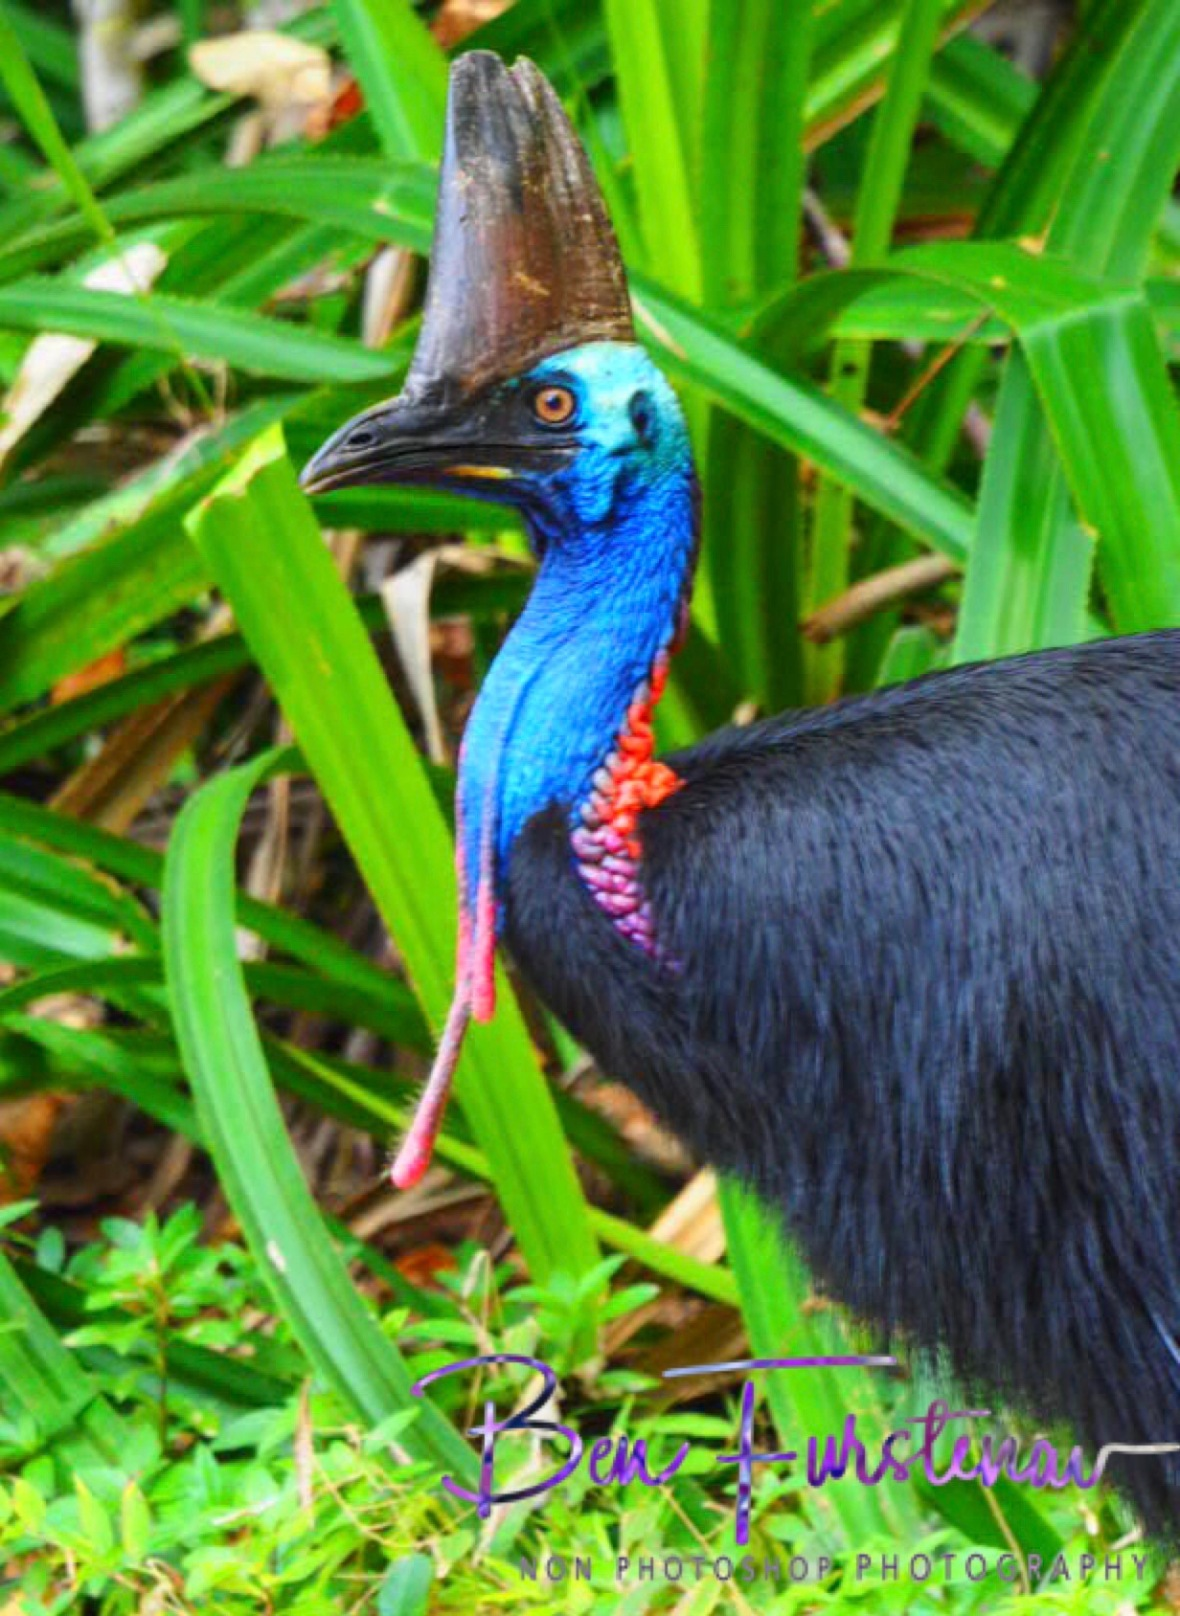 Desperate measures for desperate times @ Etti Bay, Northern Tropical Queensland, Australia